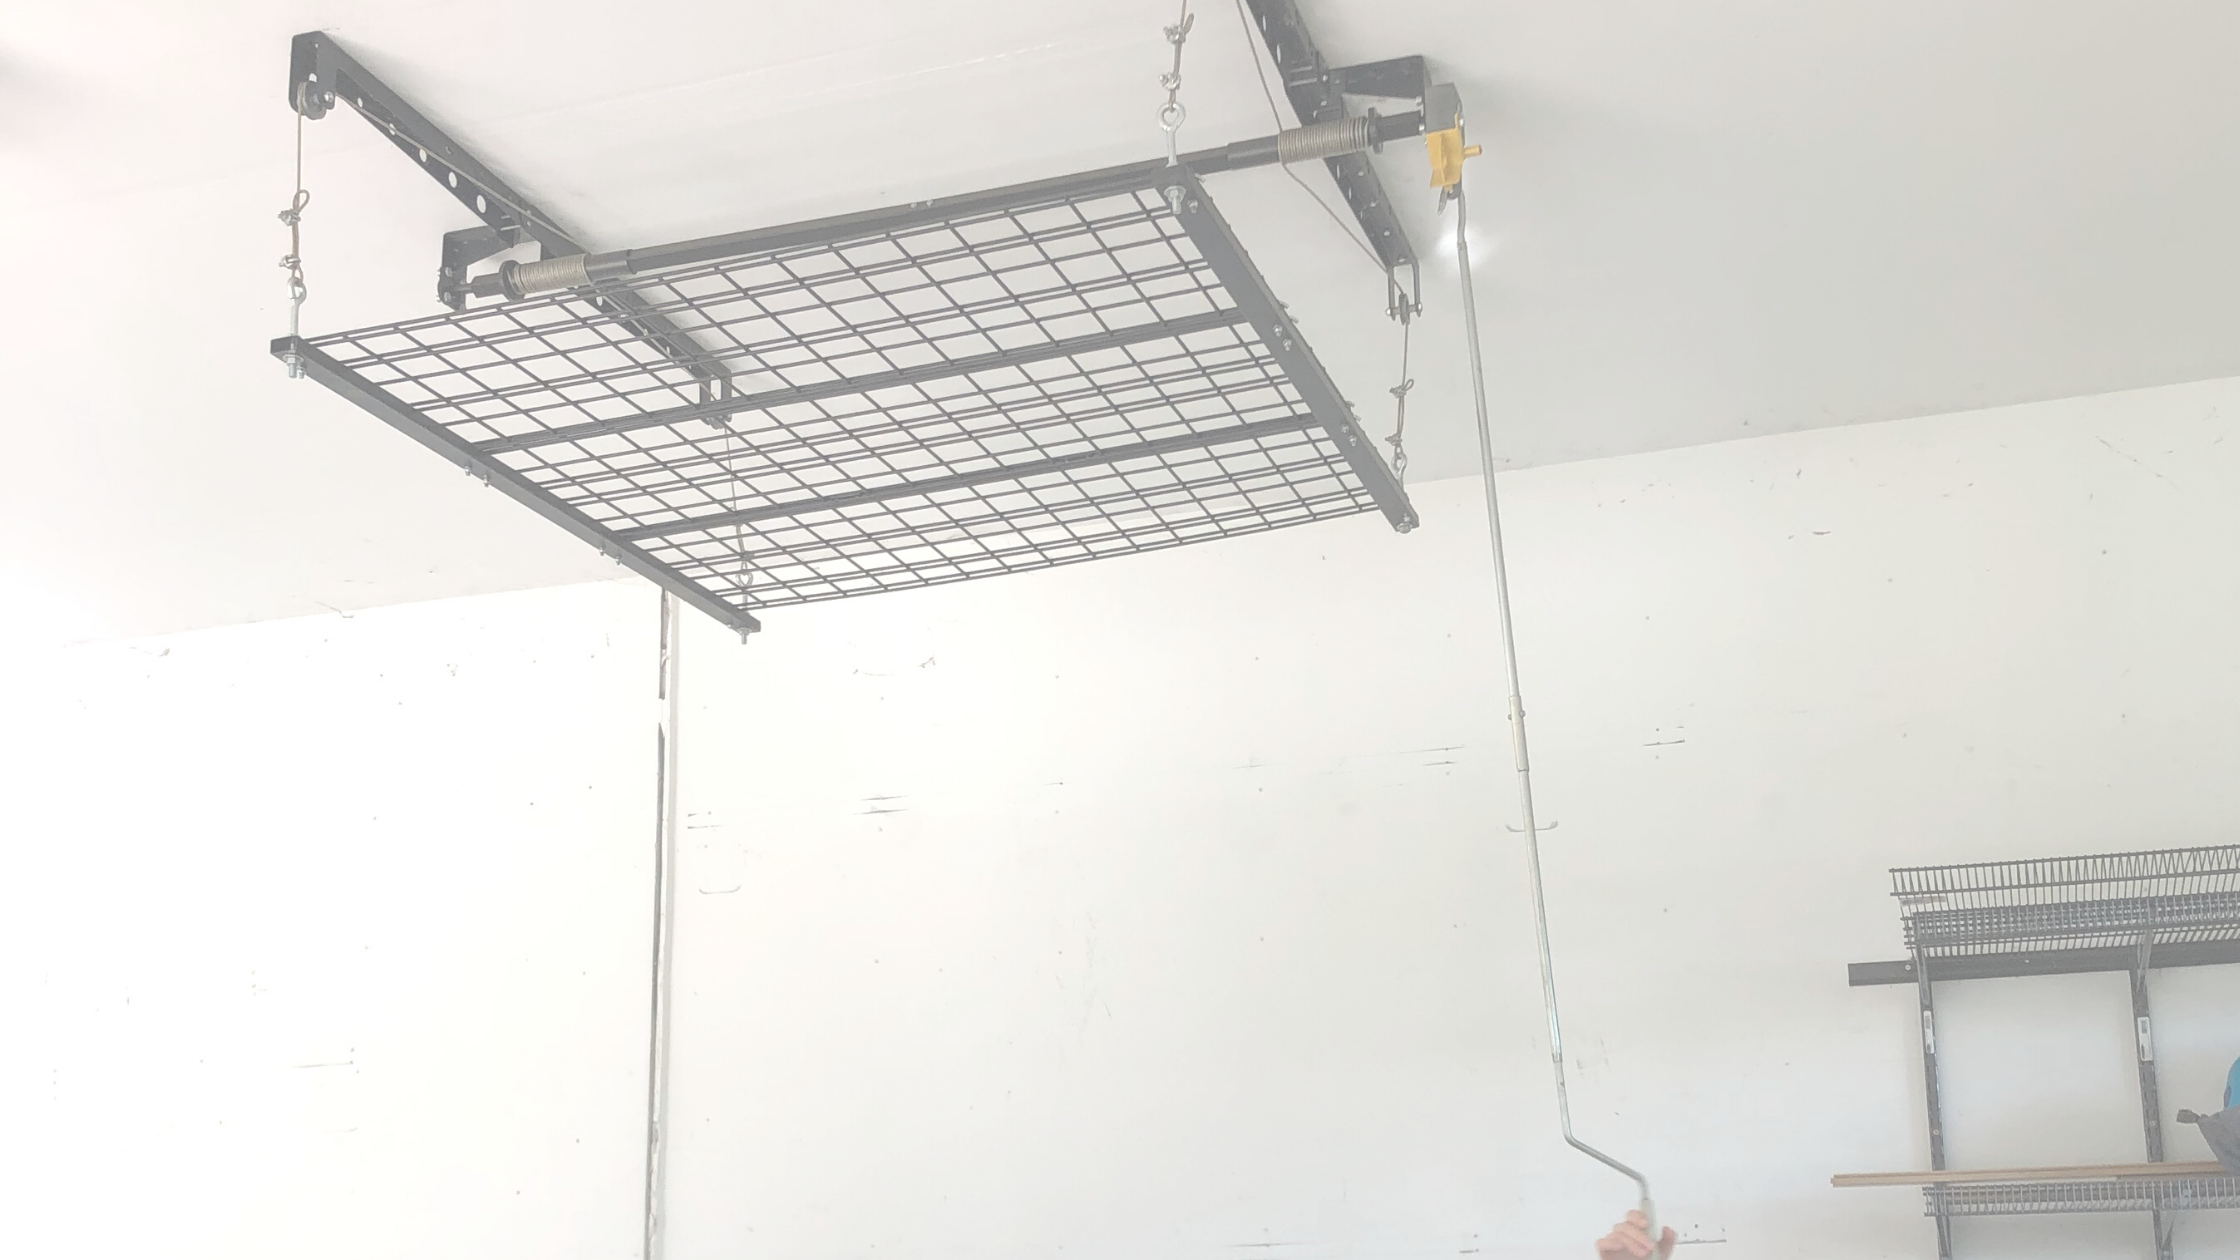 Overhead Garage Storage Ideas That Will Make Organization Easy Trubuild Construction